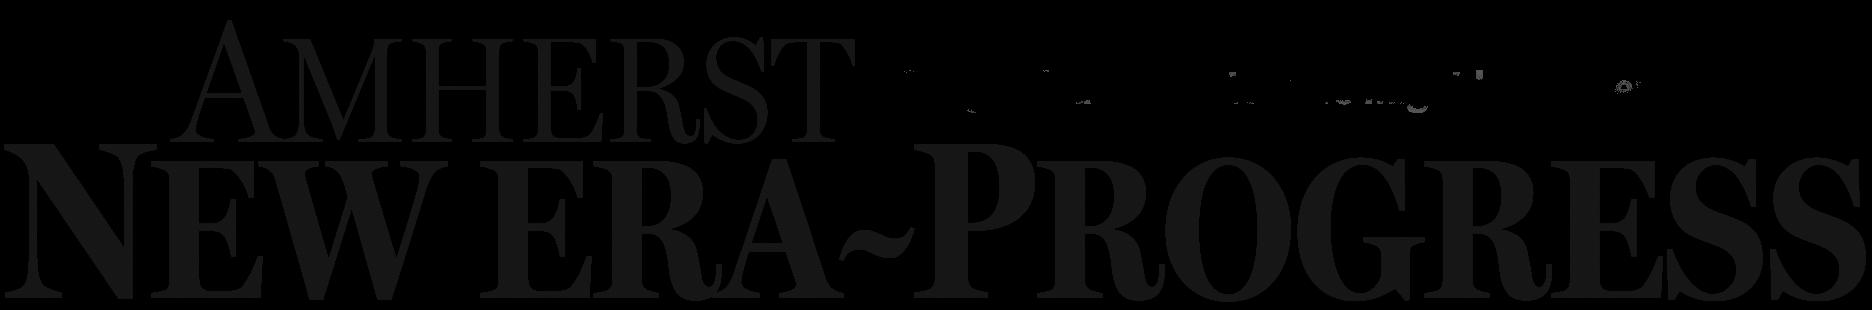 Subscribe to Amherst New Era-Progress